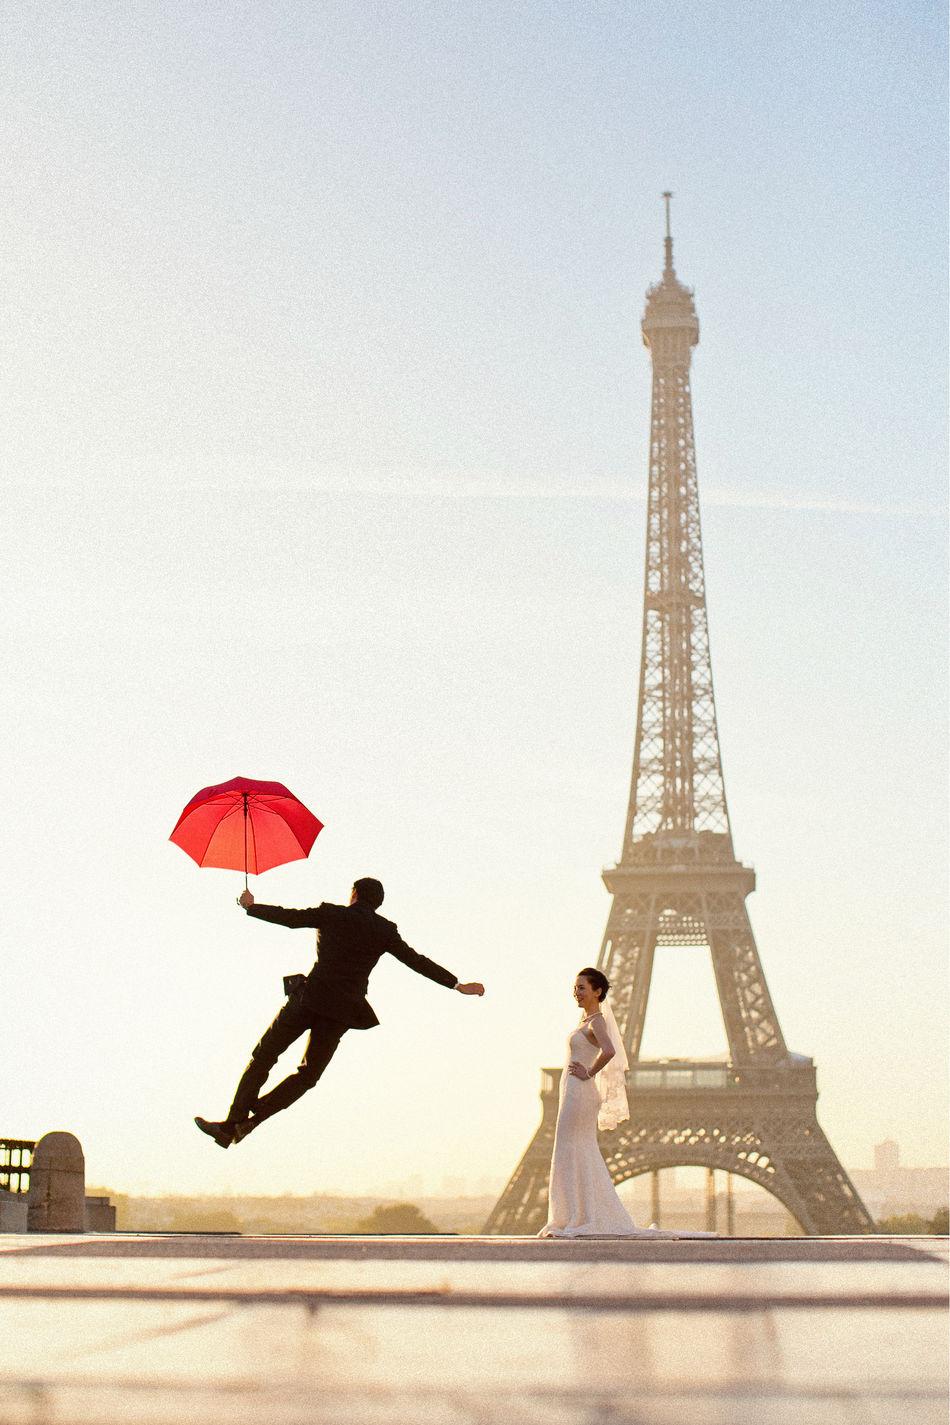 Beautiful stock photos of hochzeit, tower, motion, architecture, leisure activity